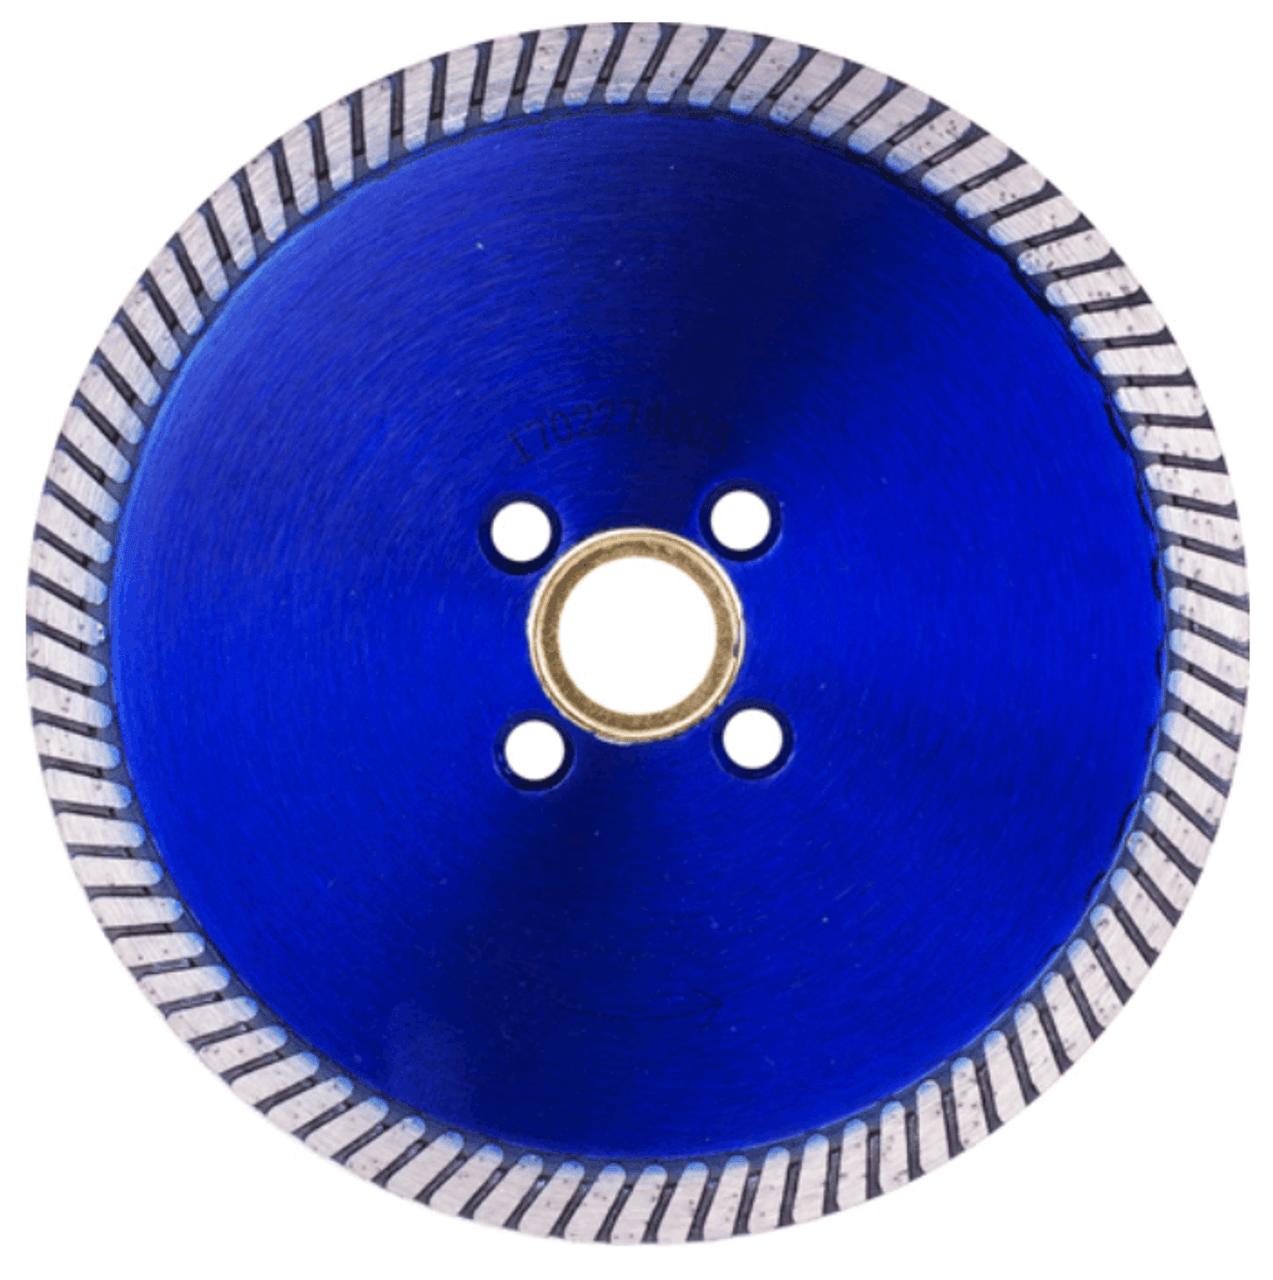 Triton Blue Turbo Blade